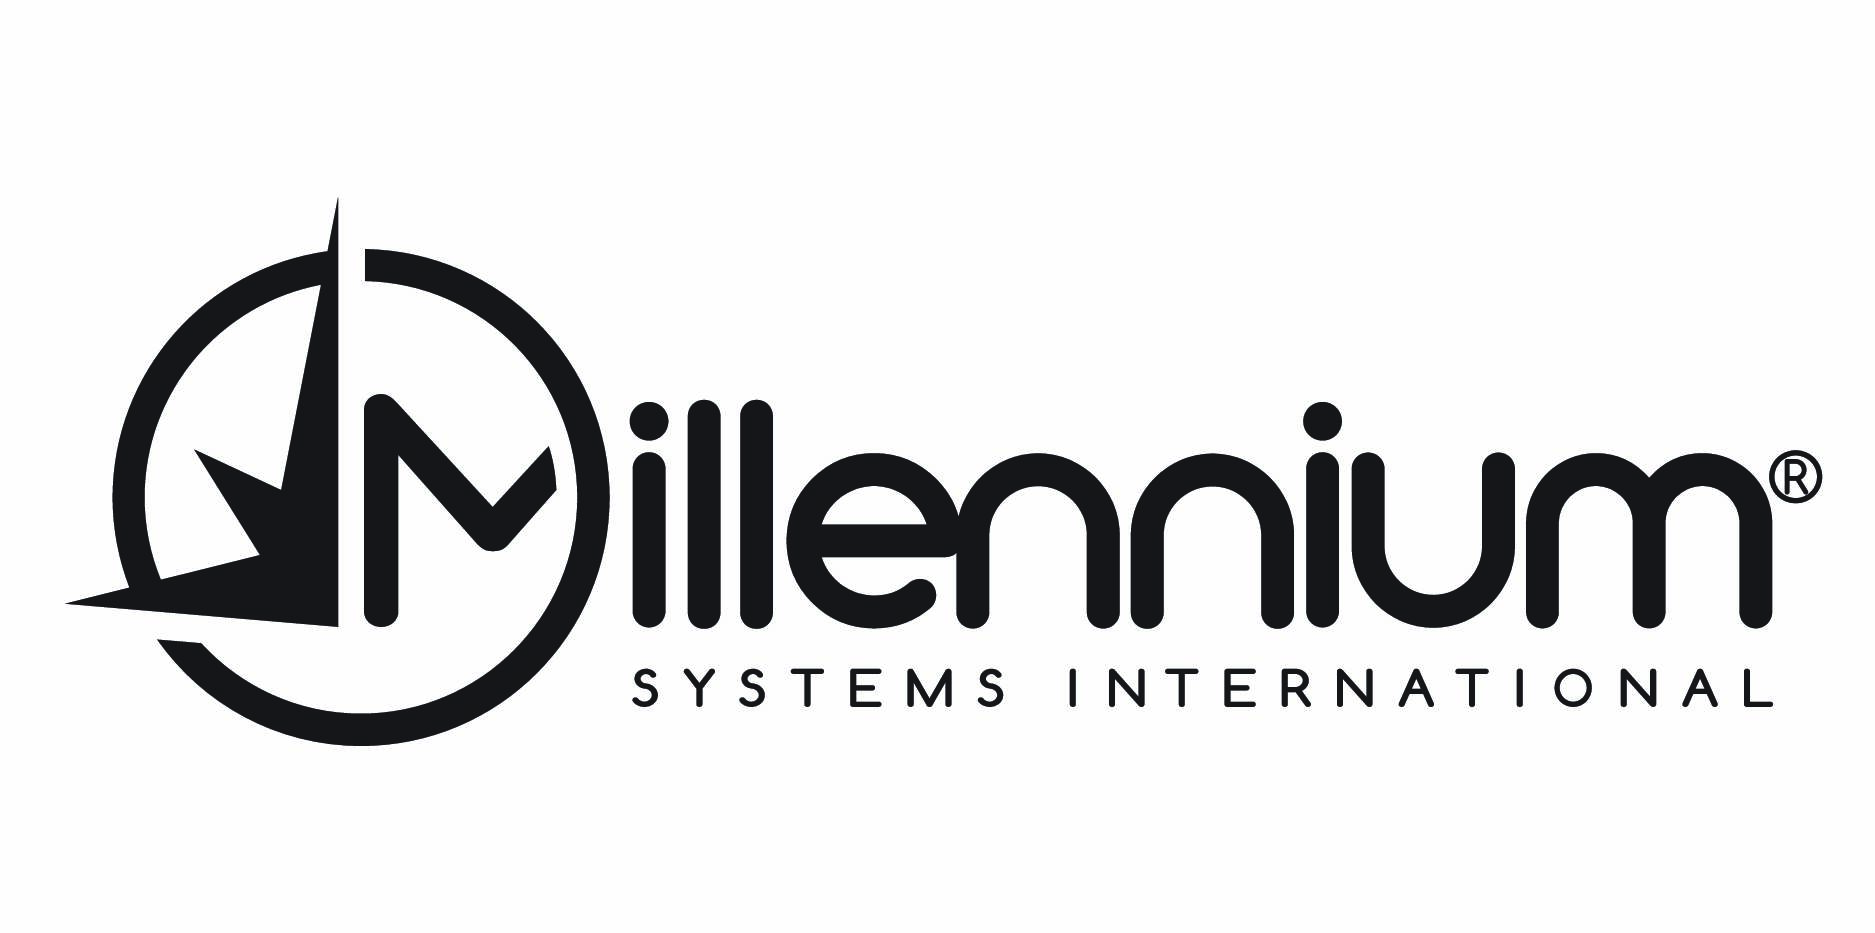 MillenniumSI-logo-blk.jpg